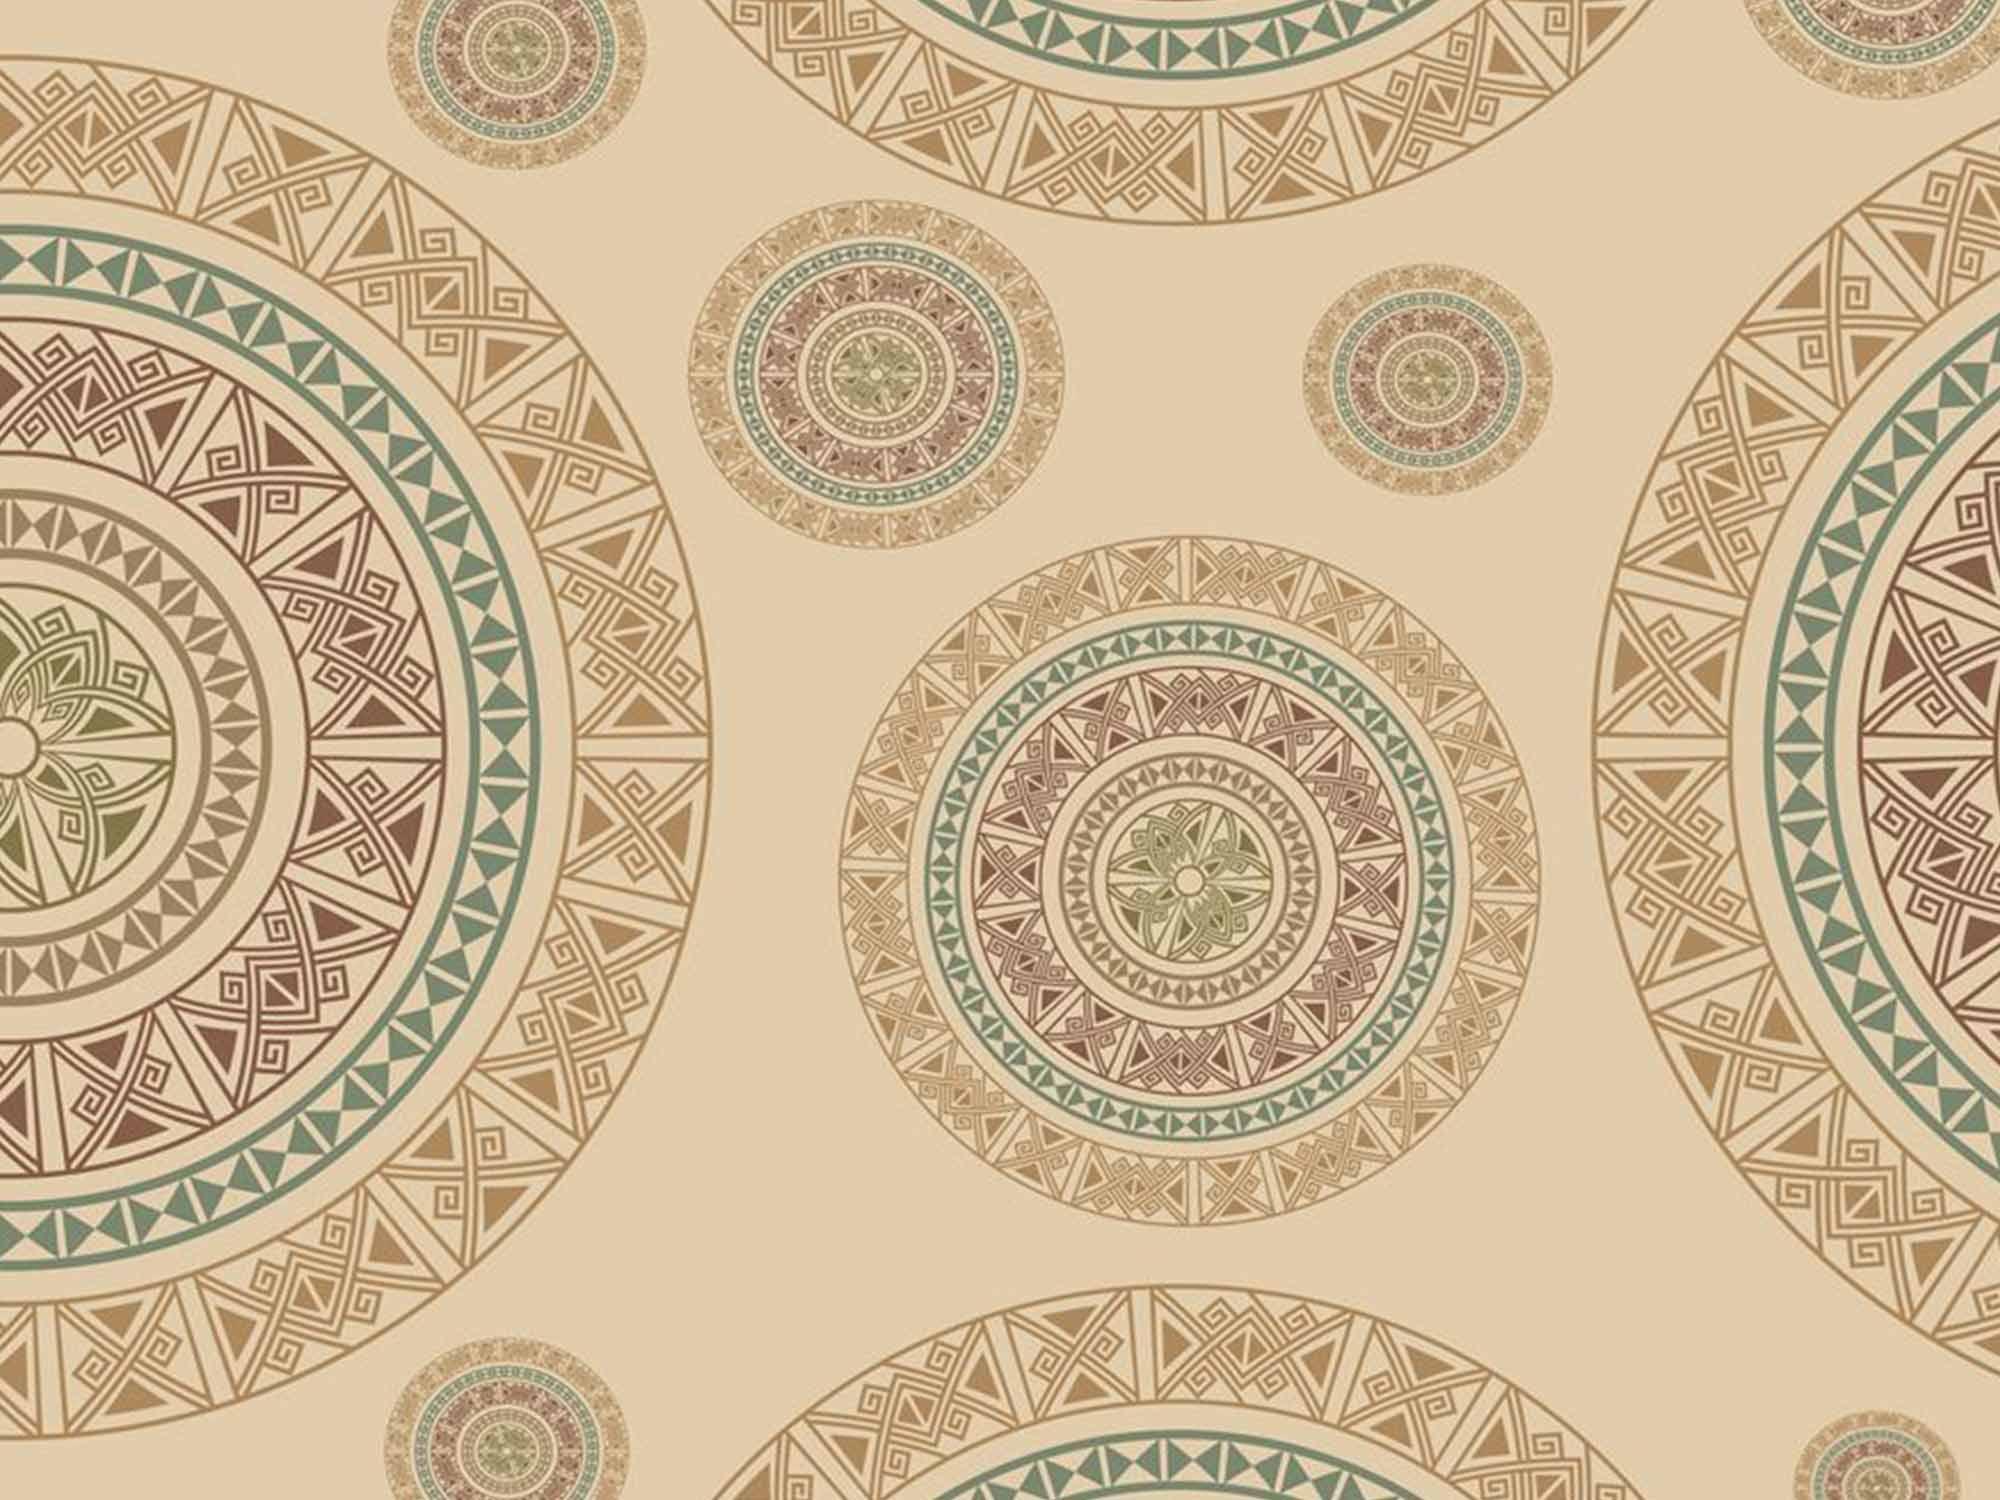 Papel de Parede Indiano 0001 - Adesivos de Parede  - Paredes Decoradas